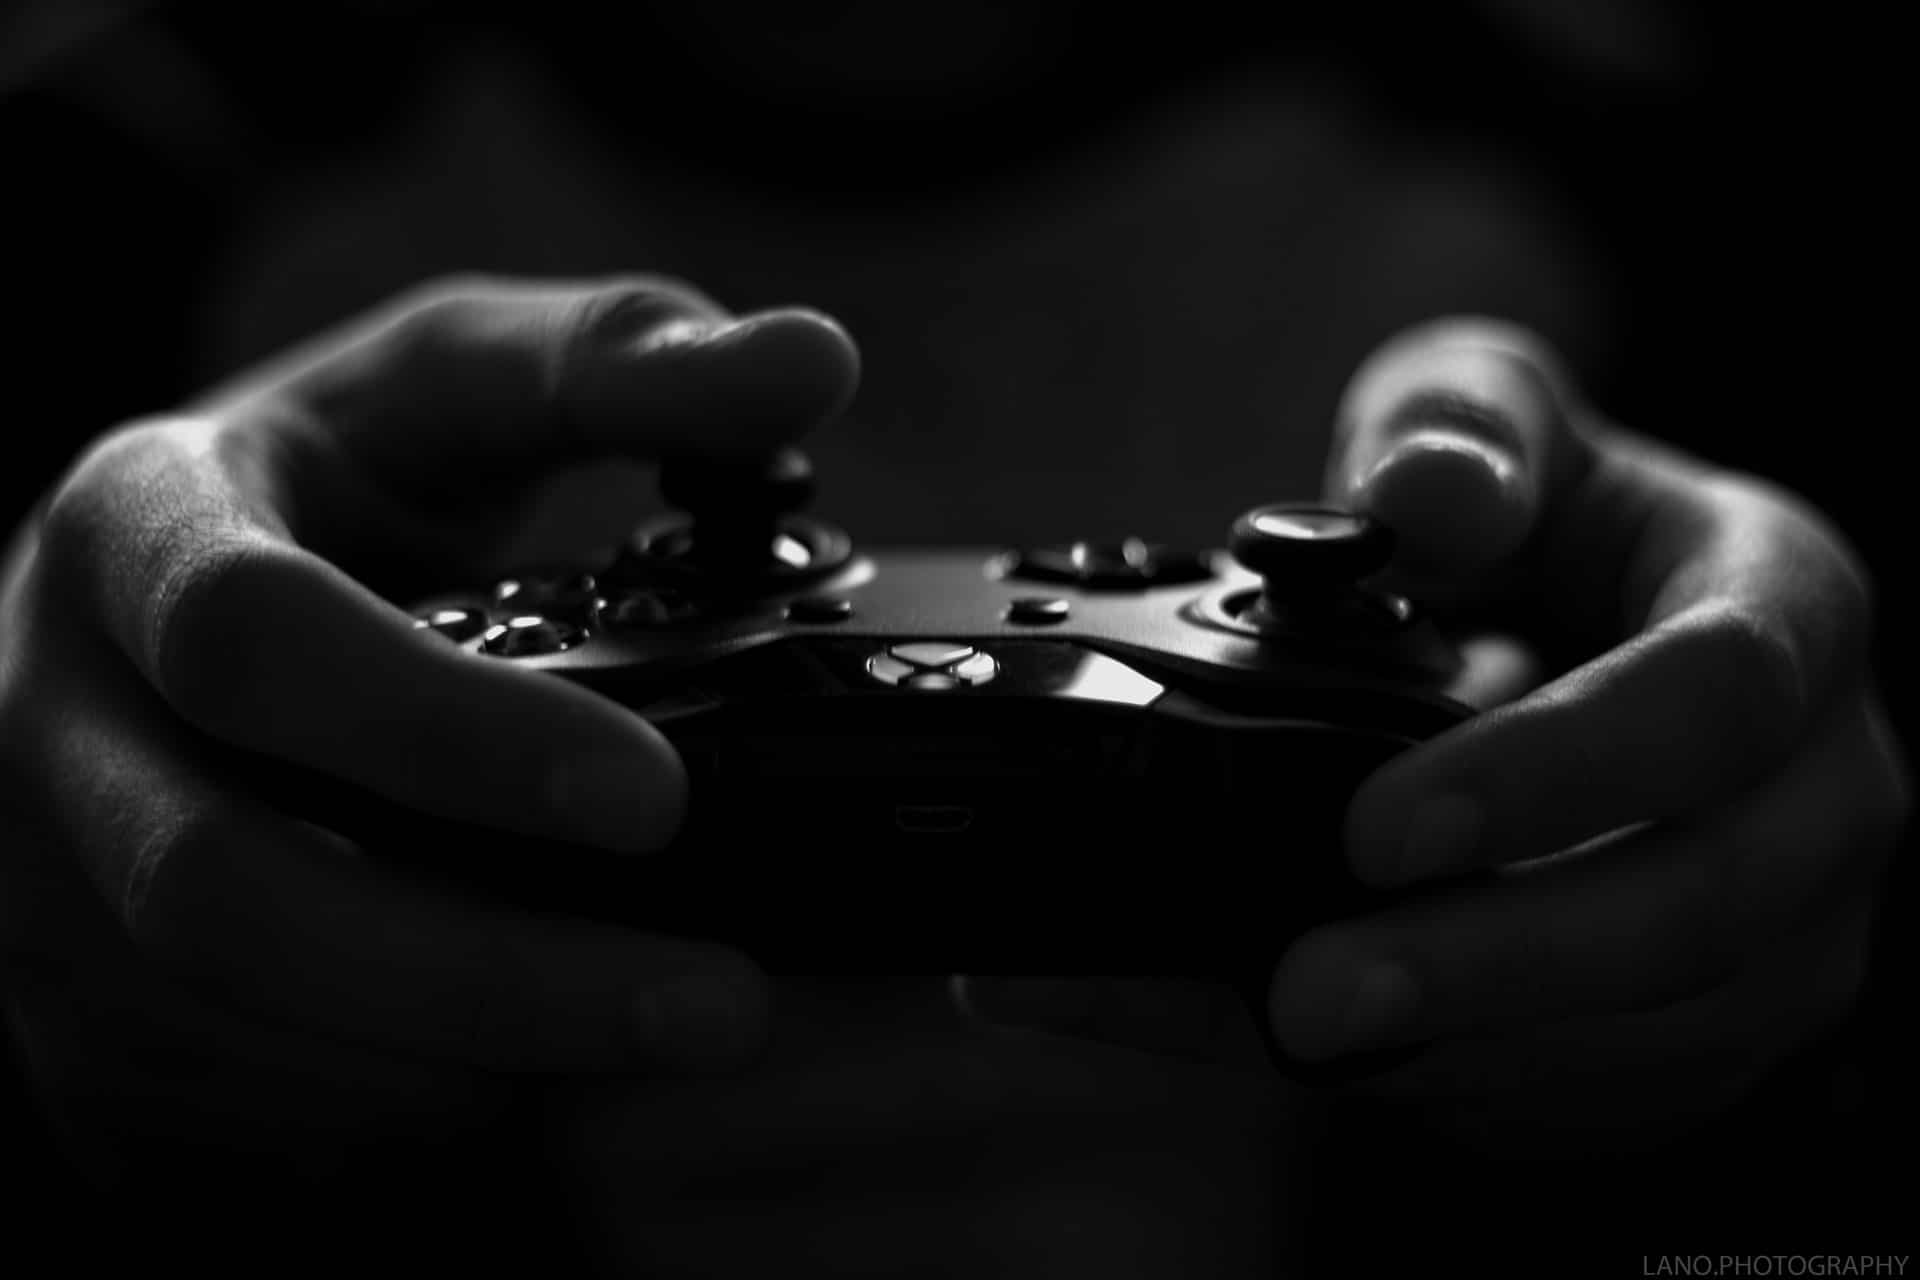 Video Game statistics